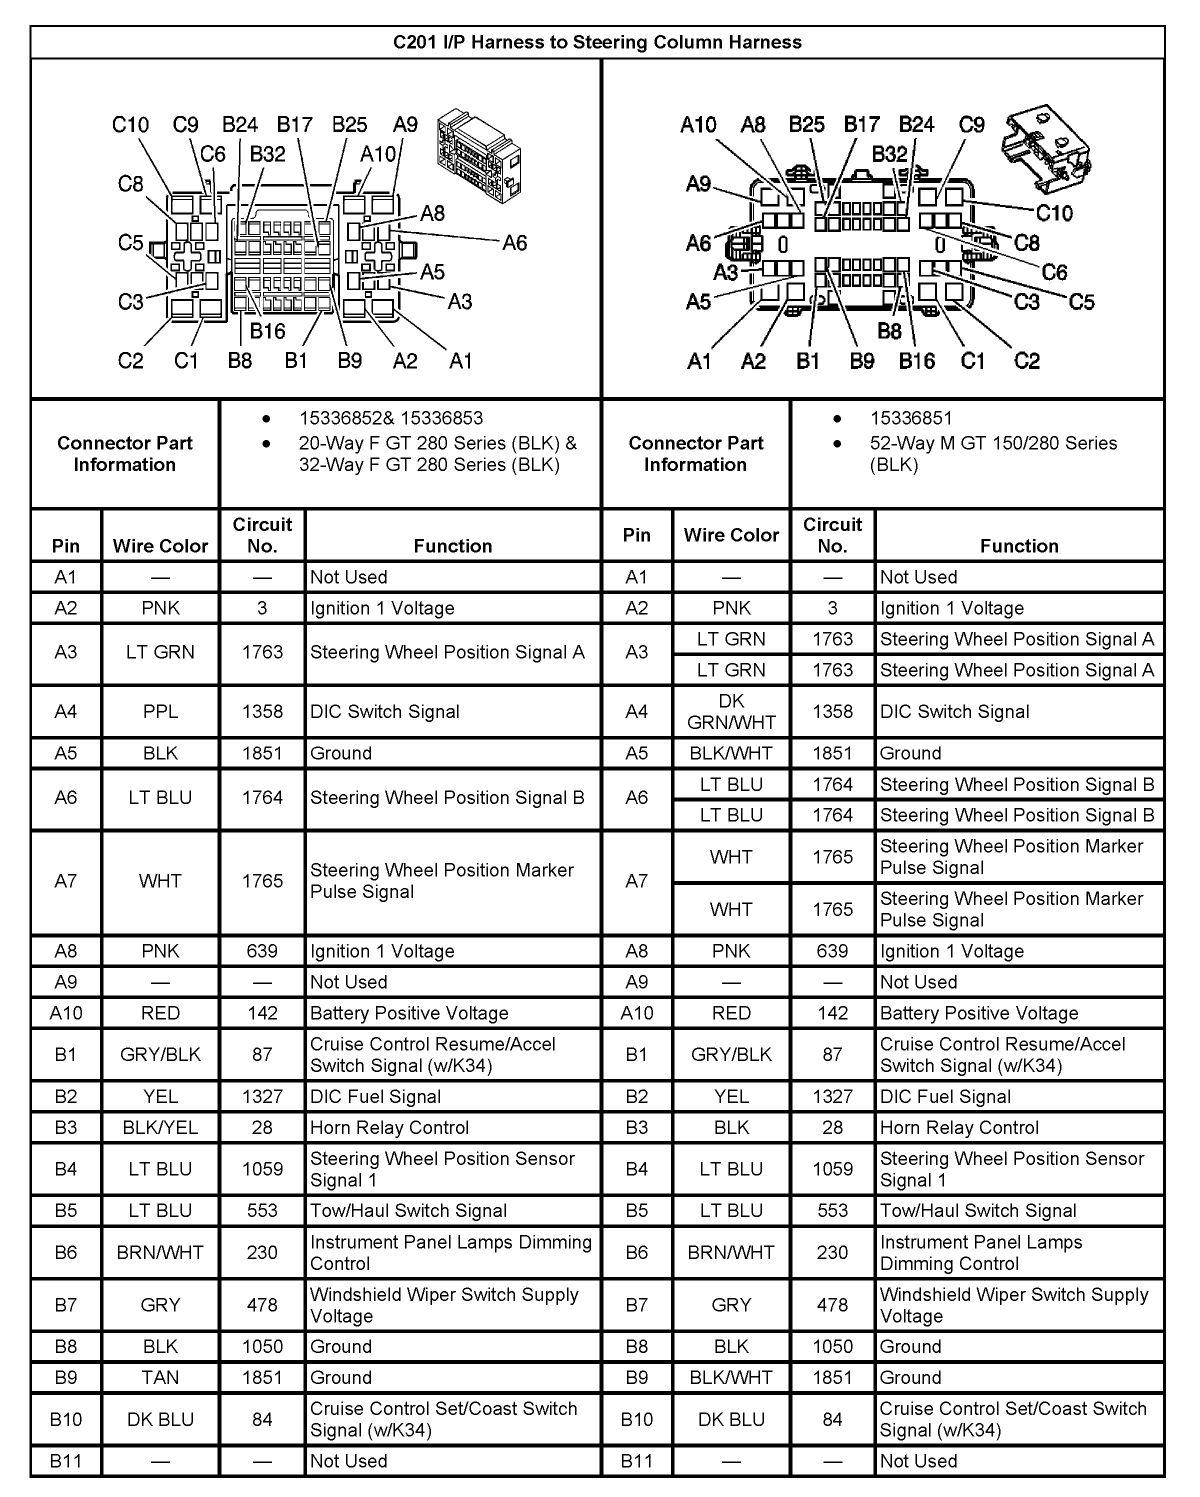 2019 Silverado Radio Wiring Diagram : silverado, radio, wiring, diagram, Luxury, Yukon, Radio, Wiring, Diagram, Yukon,, Chevy, Trailblazer,, Silverado